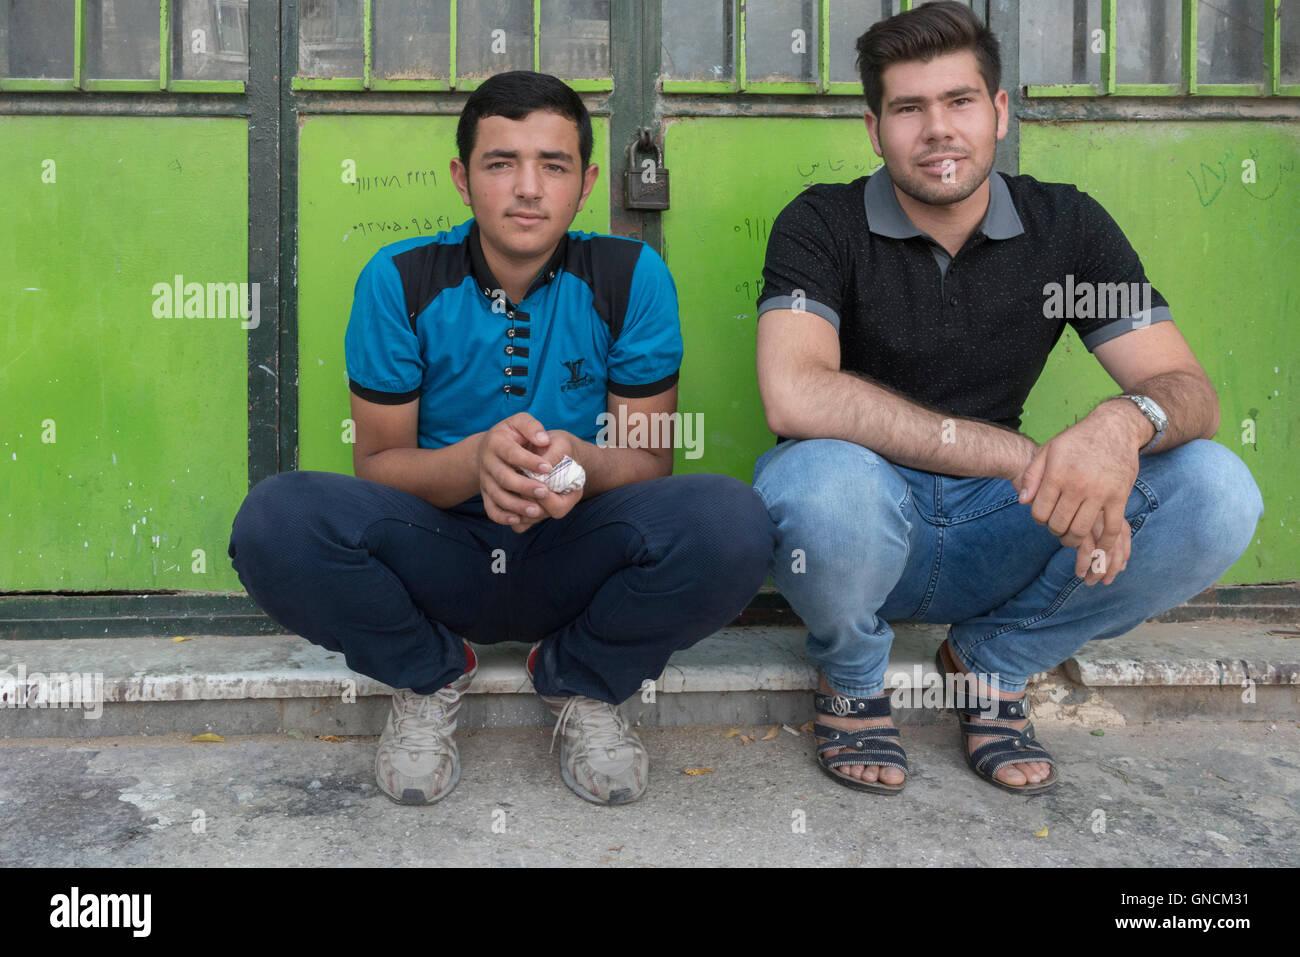 Bandar Torkaman, Turkmen Wedding, Two Young Men - Stock Image